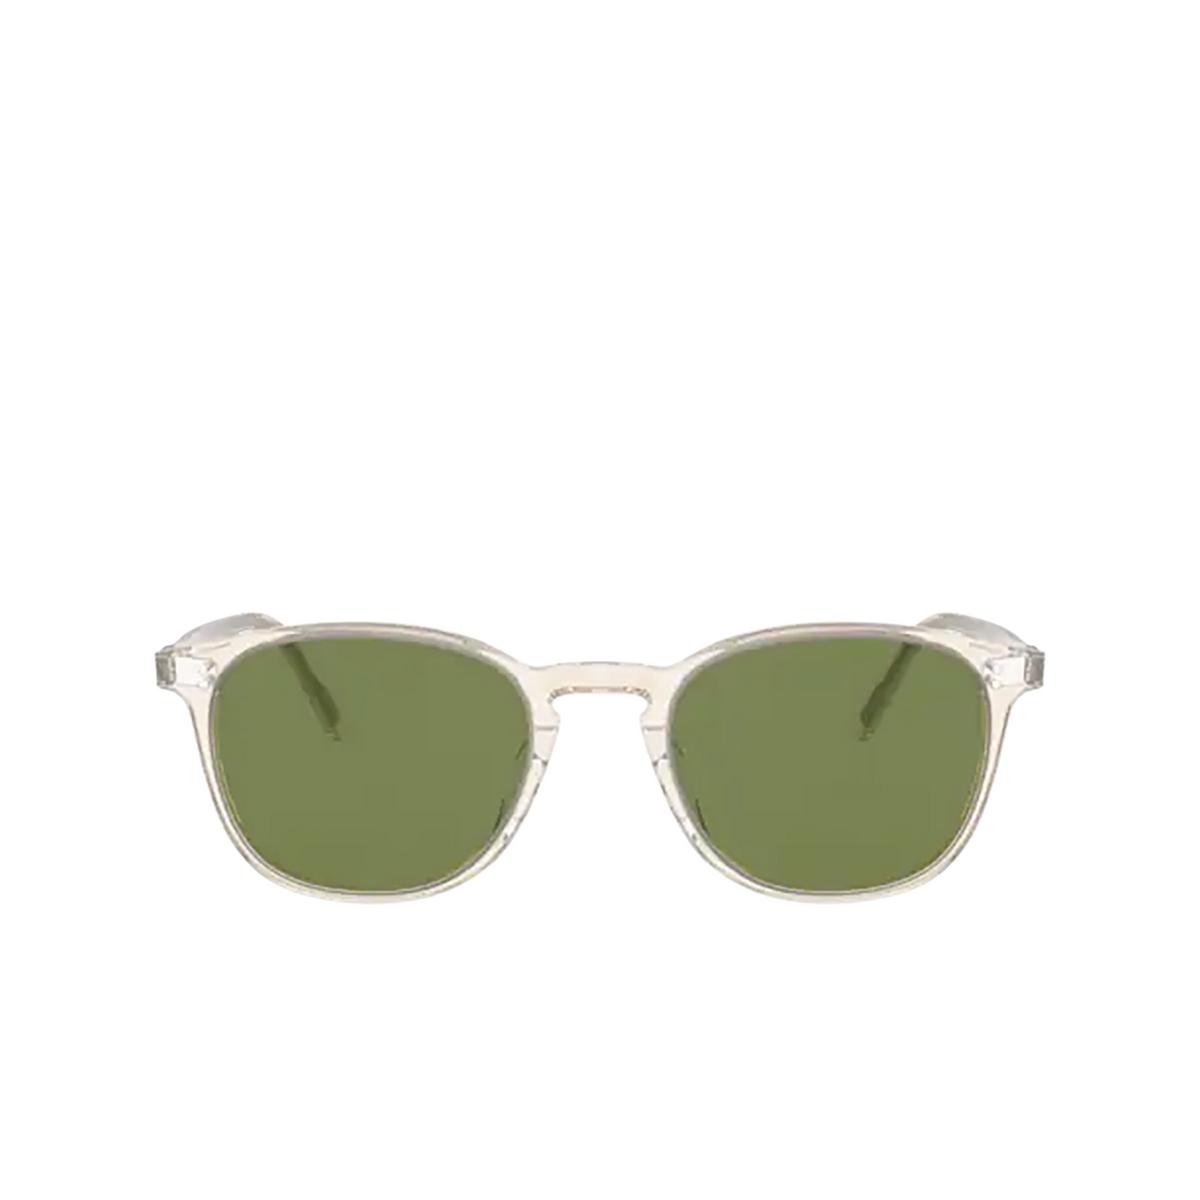 Oliver Peoples® Square Sunglasses: Finley Vintage Sun OV5397SU color Buff 109452.